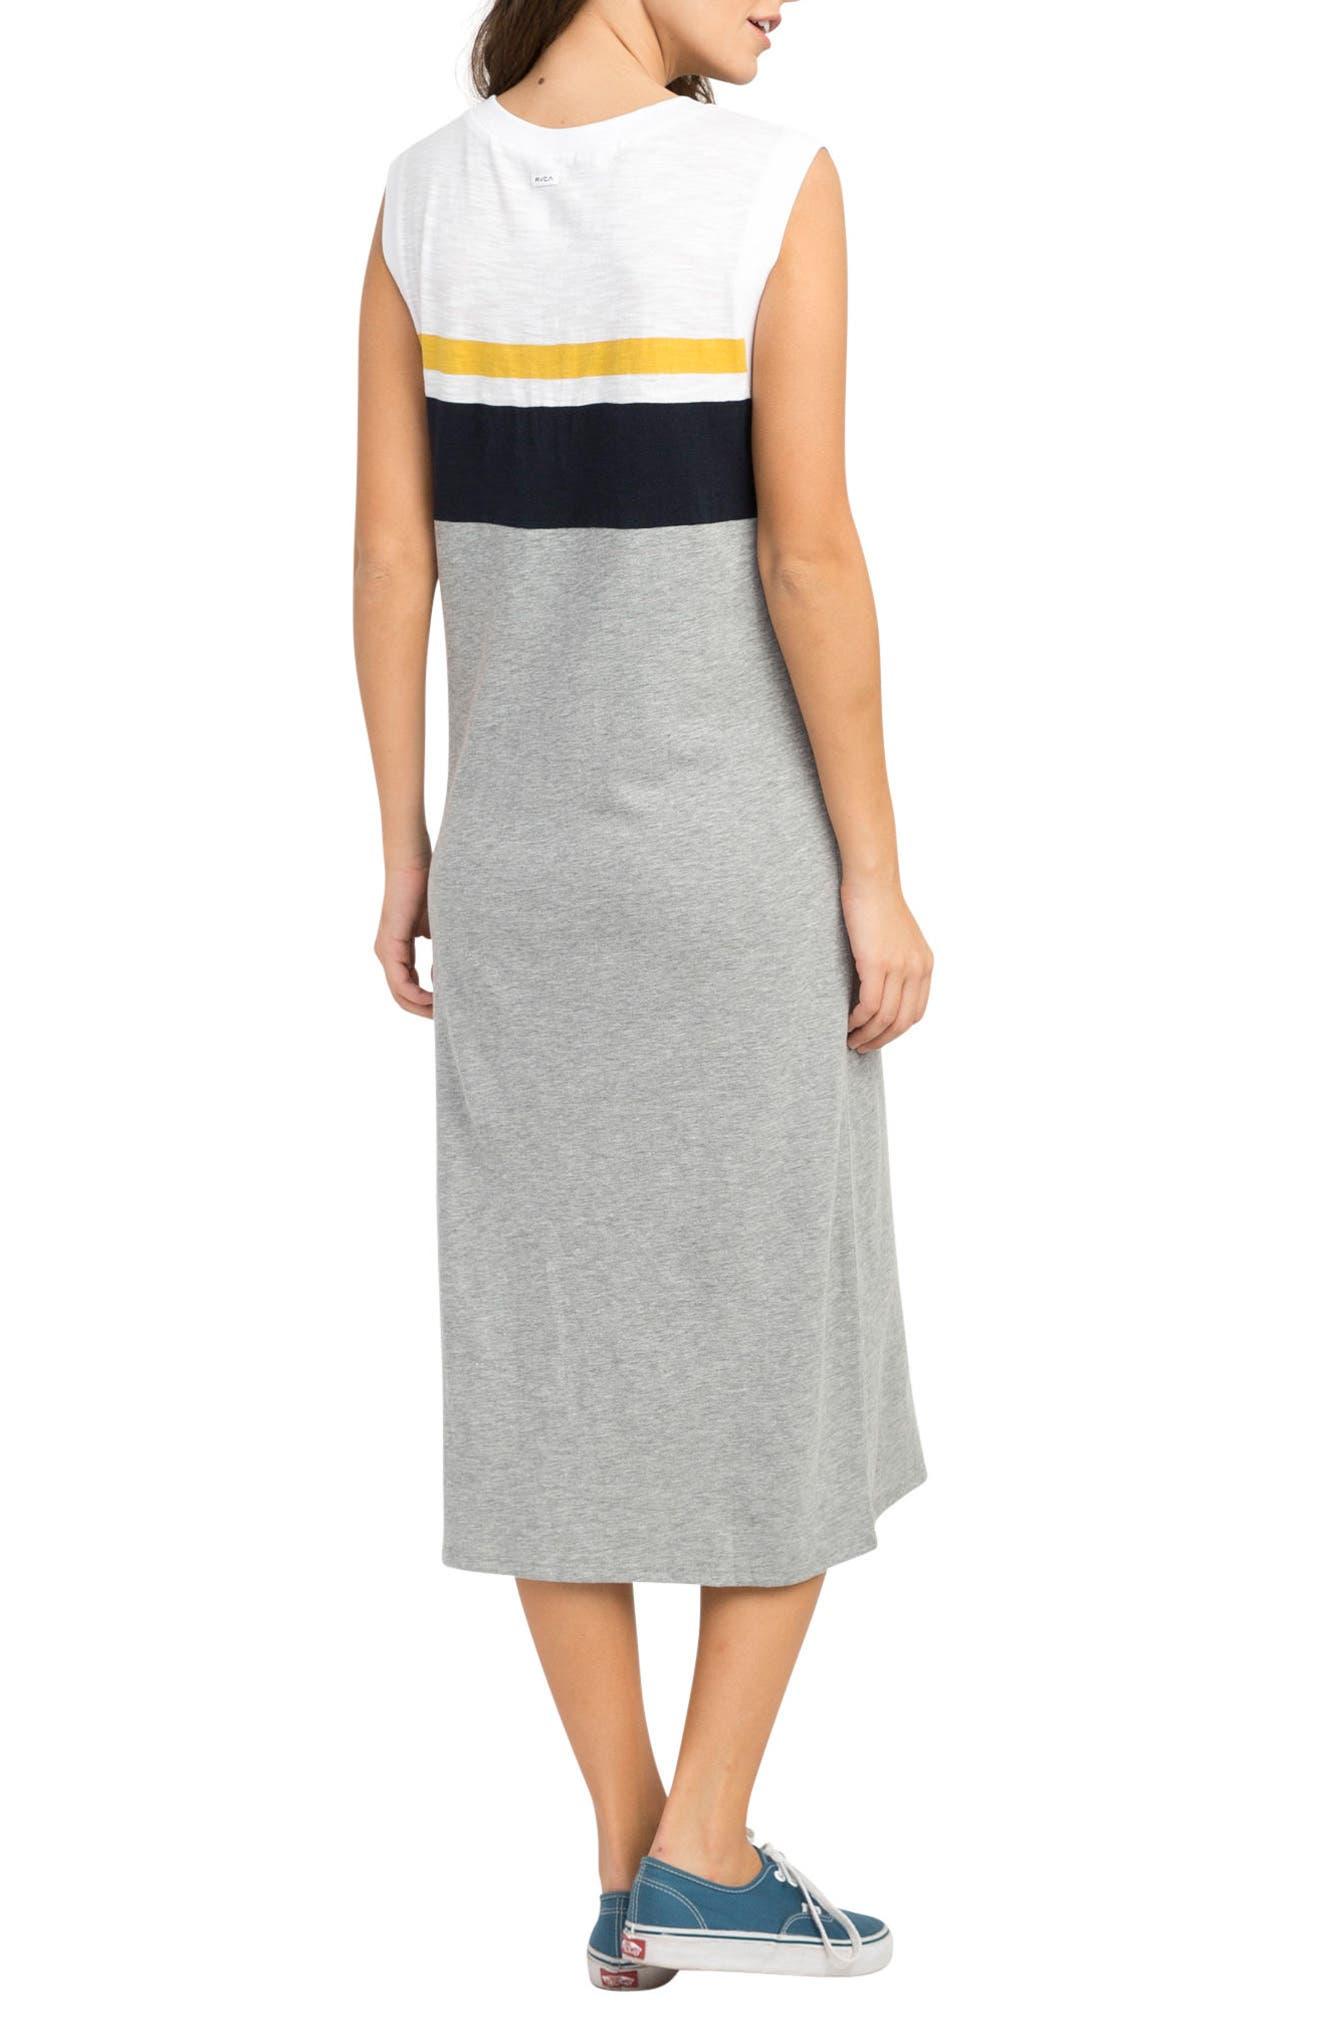 Scorekeeper Midi Dress,                             Alternate thumbnail 3, color,                             Heather Grey